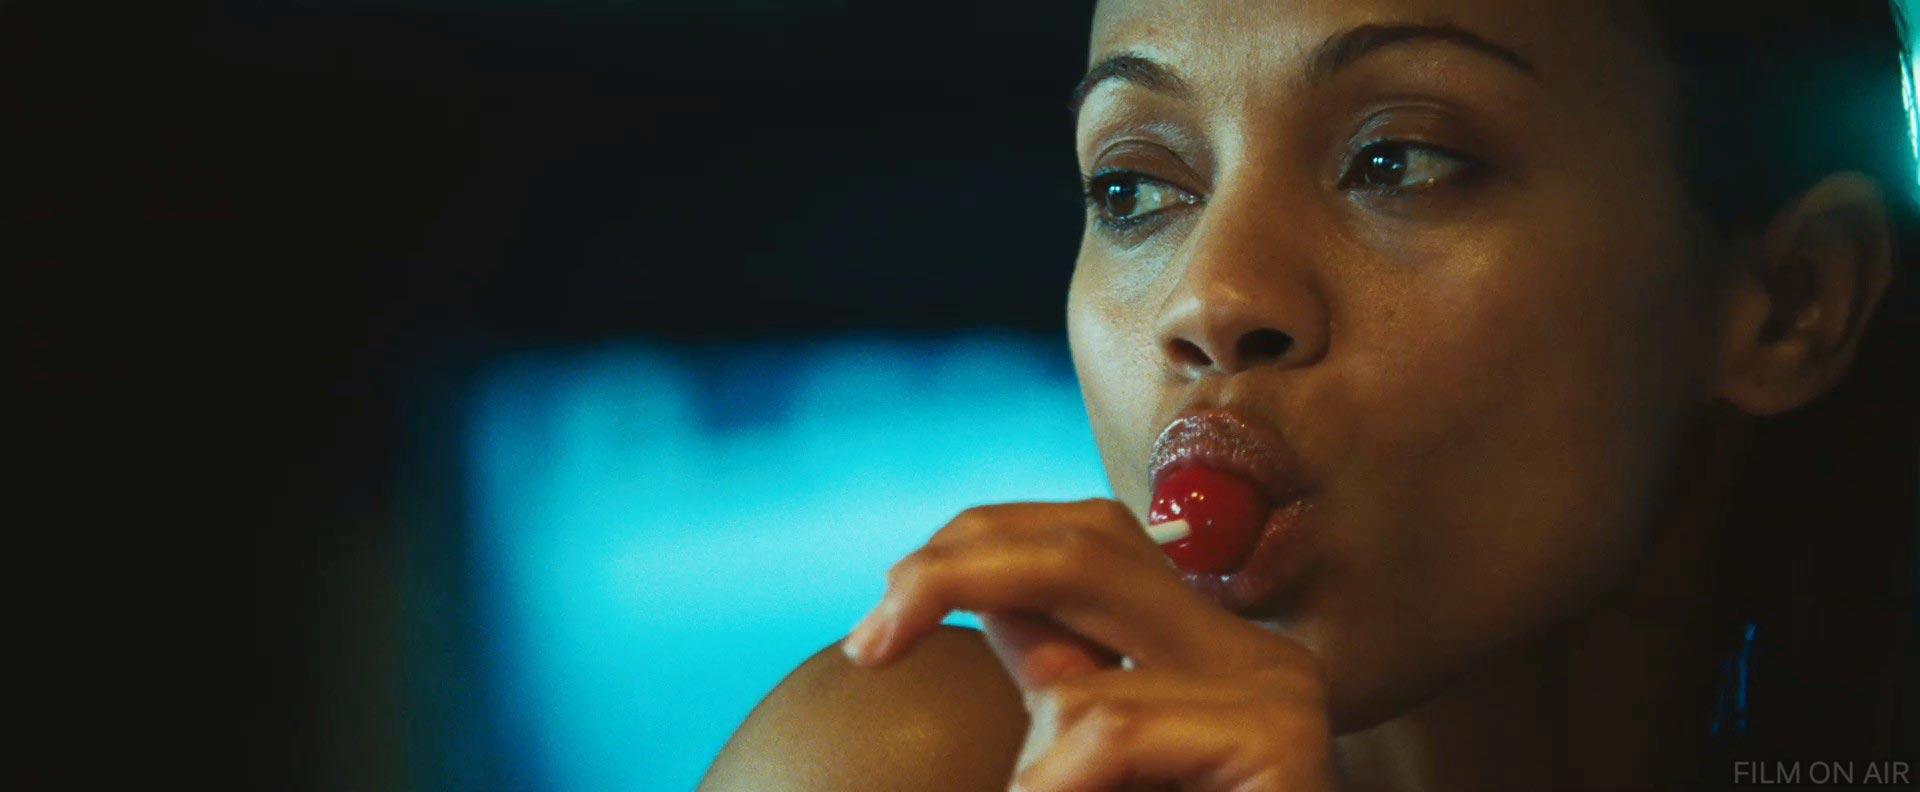 Zoe Saldana Lollipop i...